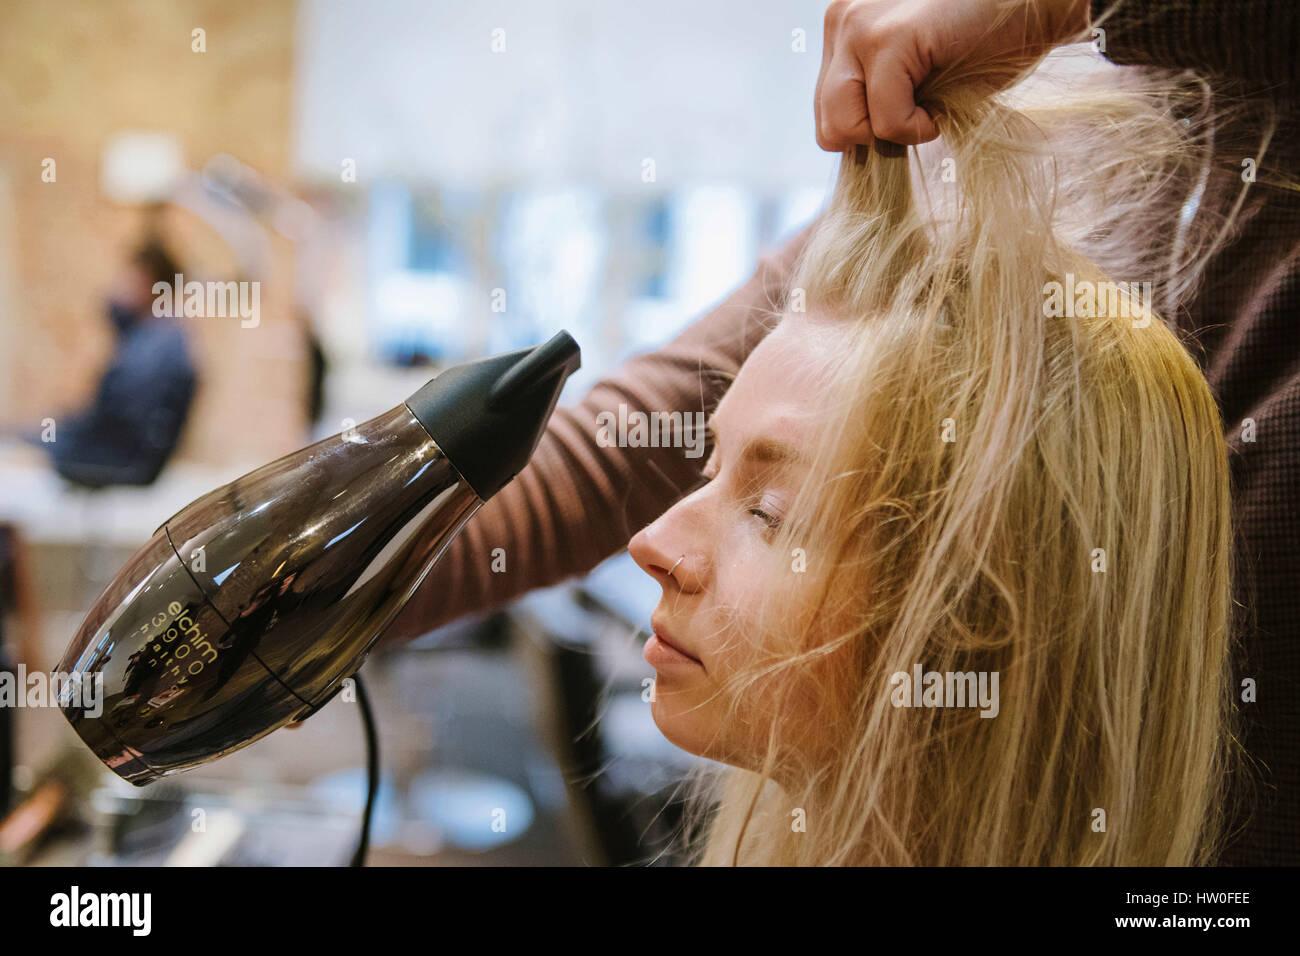 Berlin mitte germany 07th mar 2017 the hair stylist for Ruby berlin